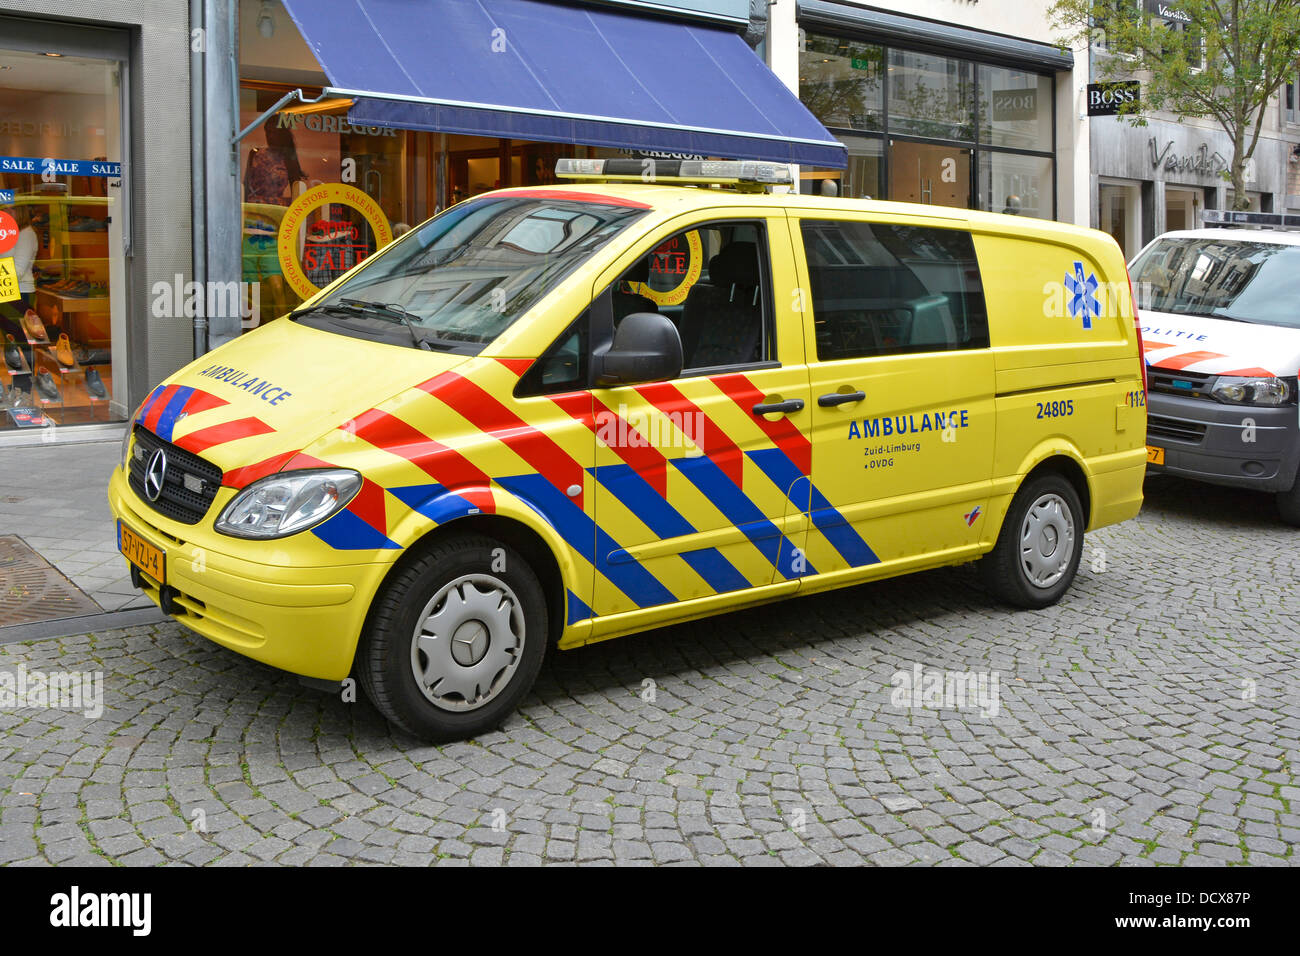 Mercedes Benz Ambulance Stock Photos & Mercedes Benz